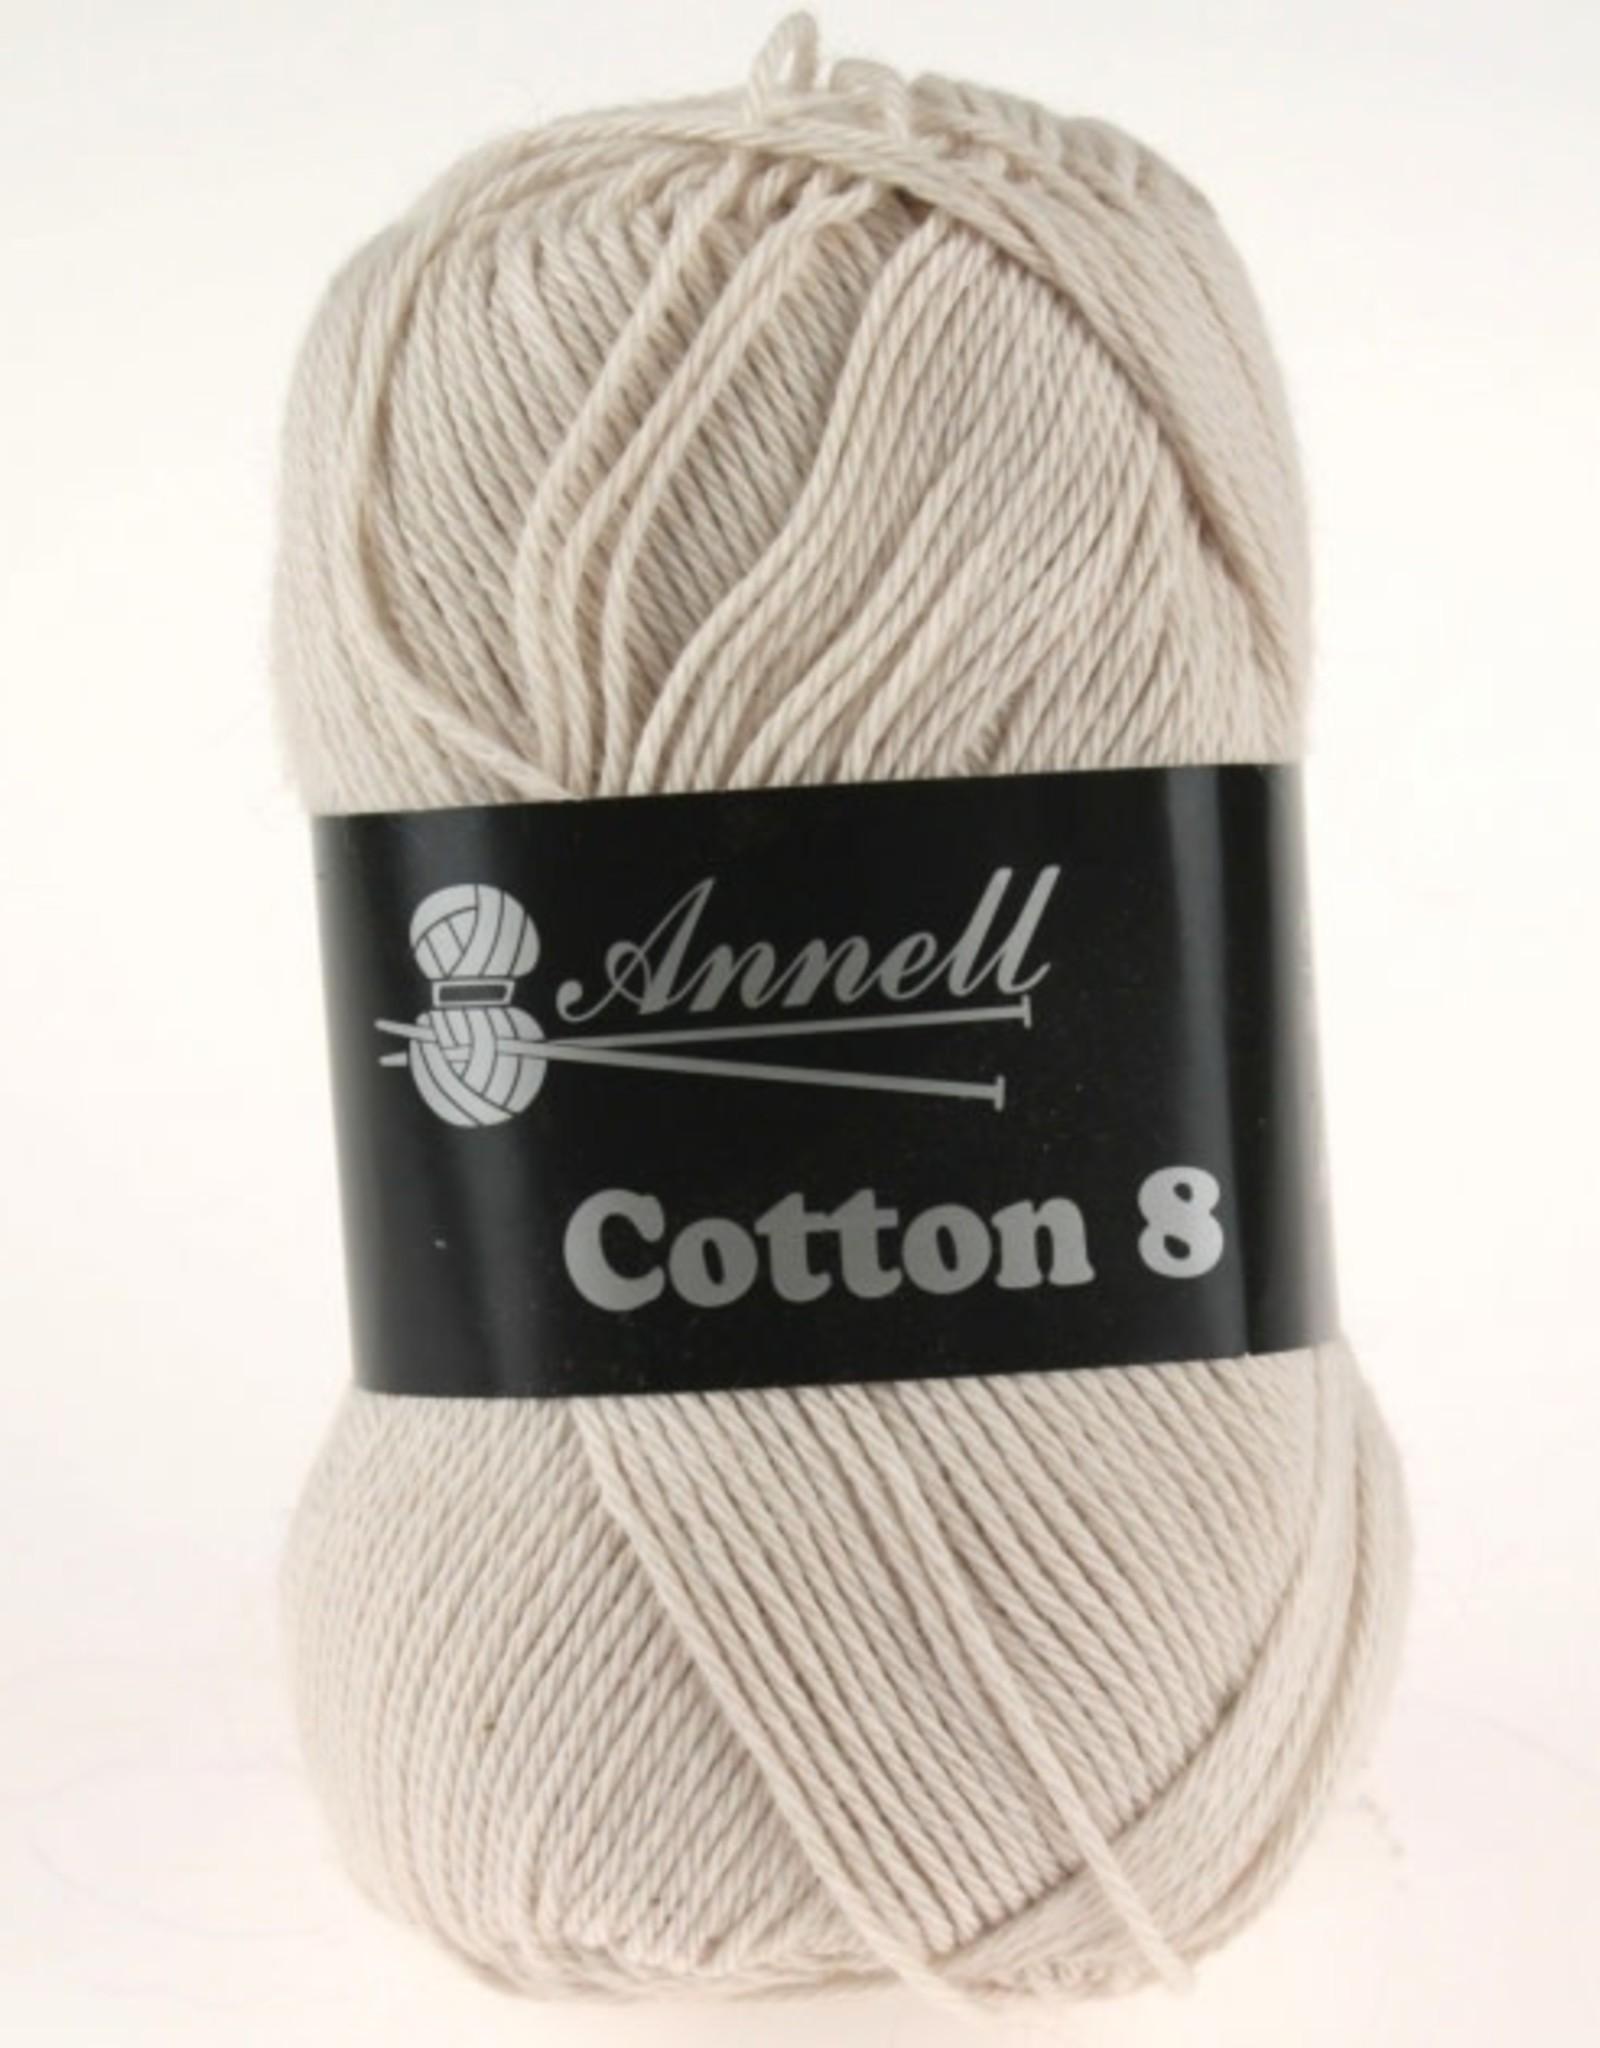 Annell Annell Cotton 8 56